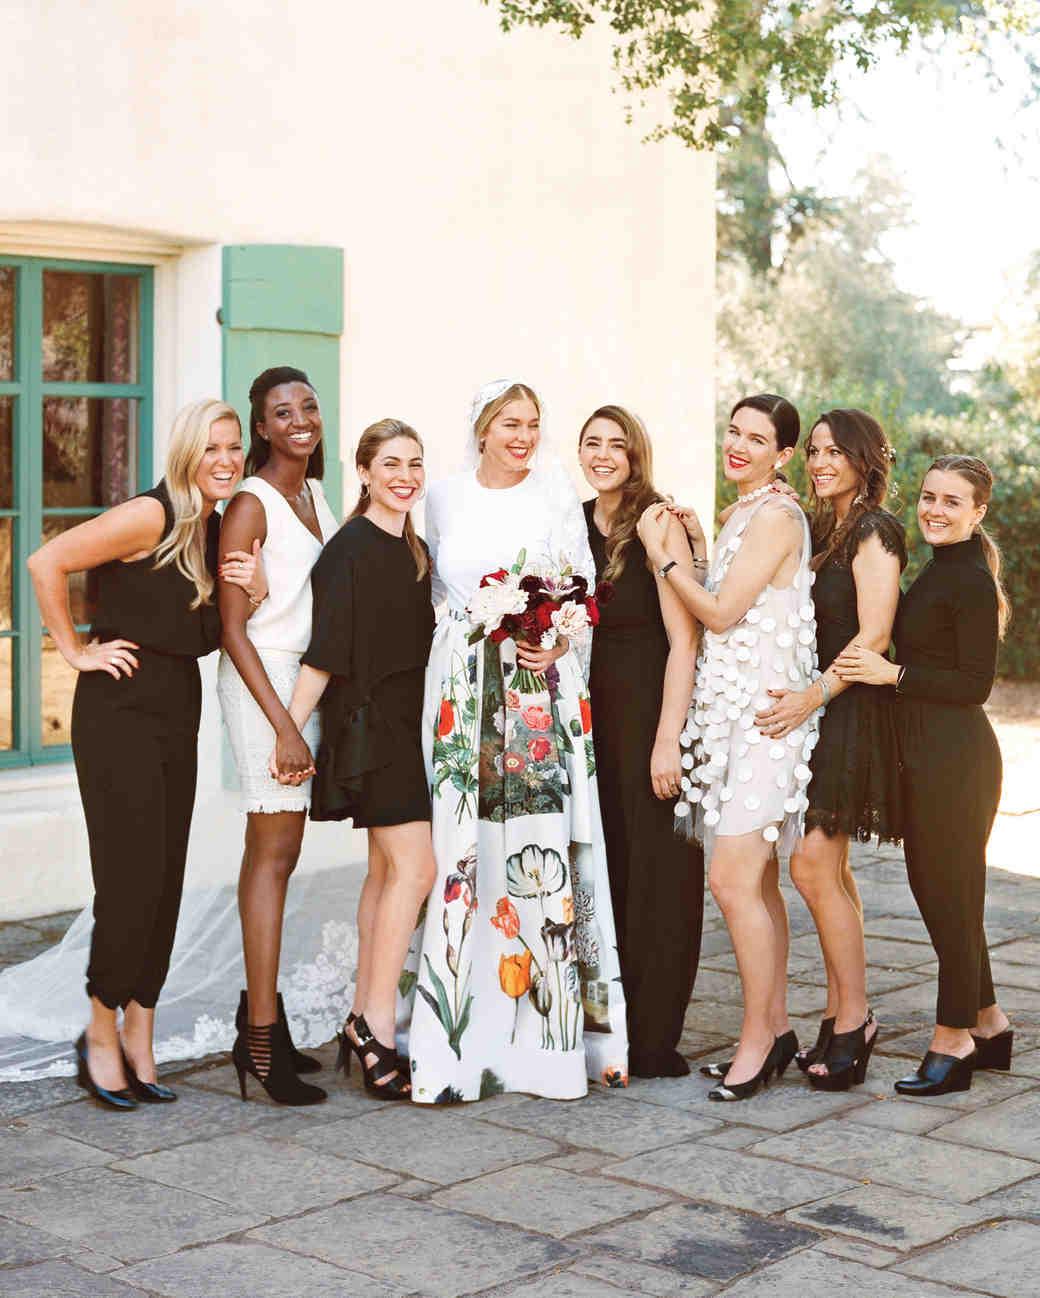 Black bridesmaid dresses different styles dress images black bridesmaid dresses different styles ombrellifo Gallery